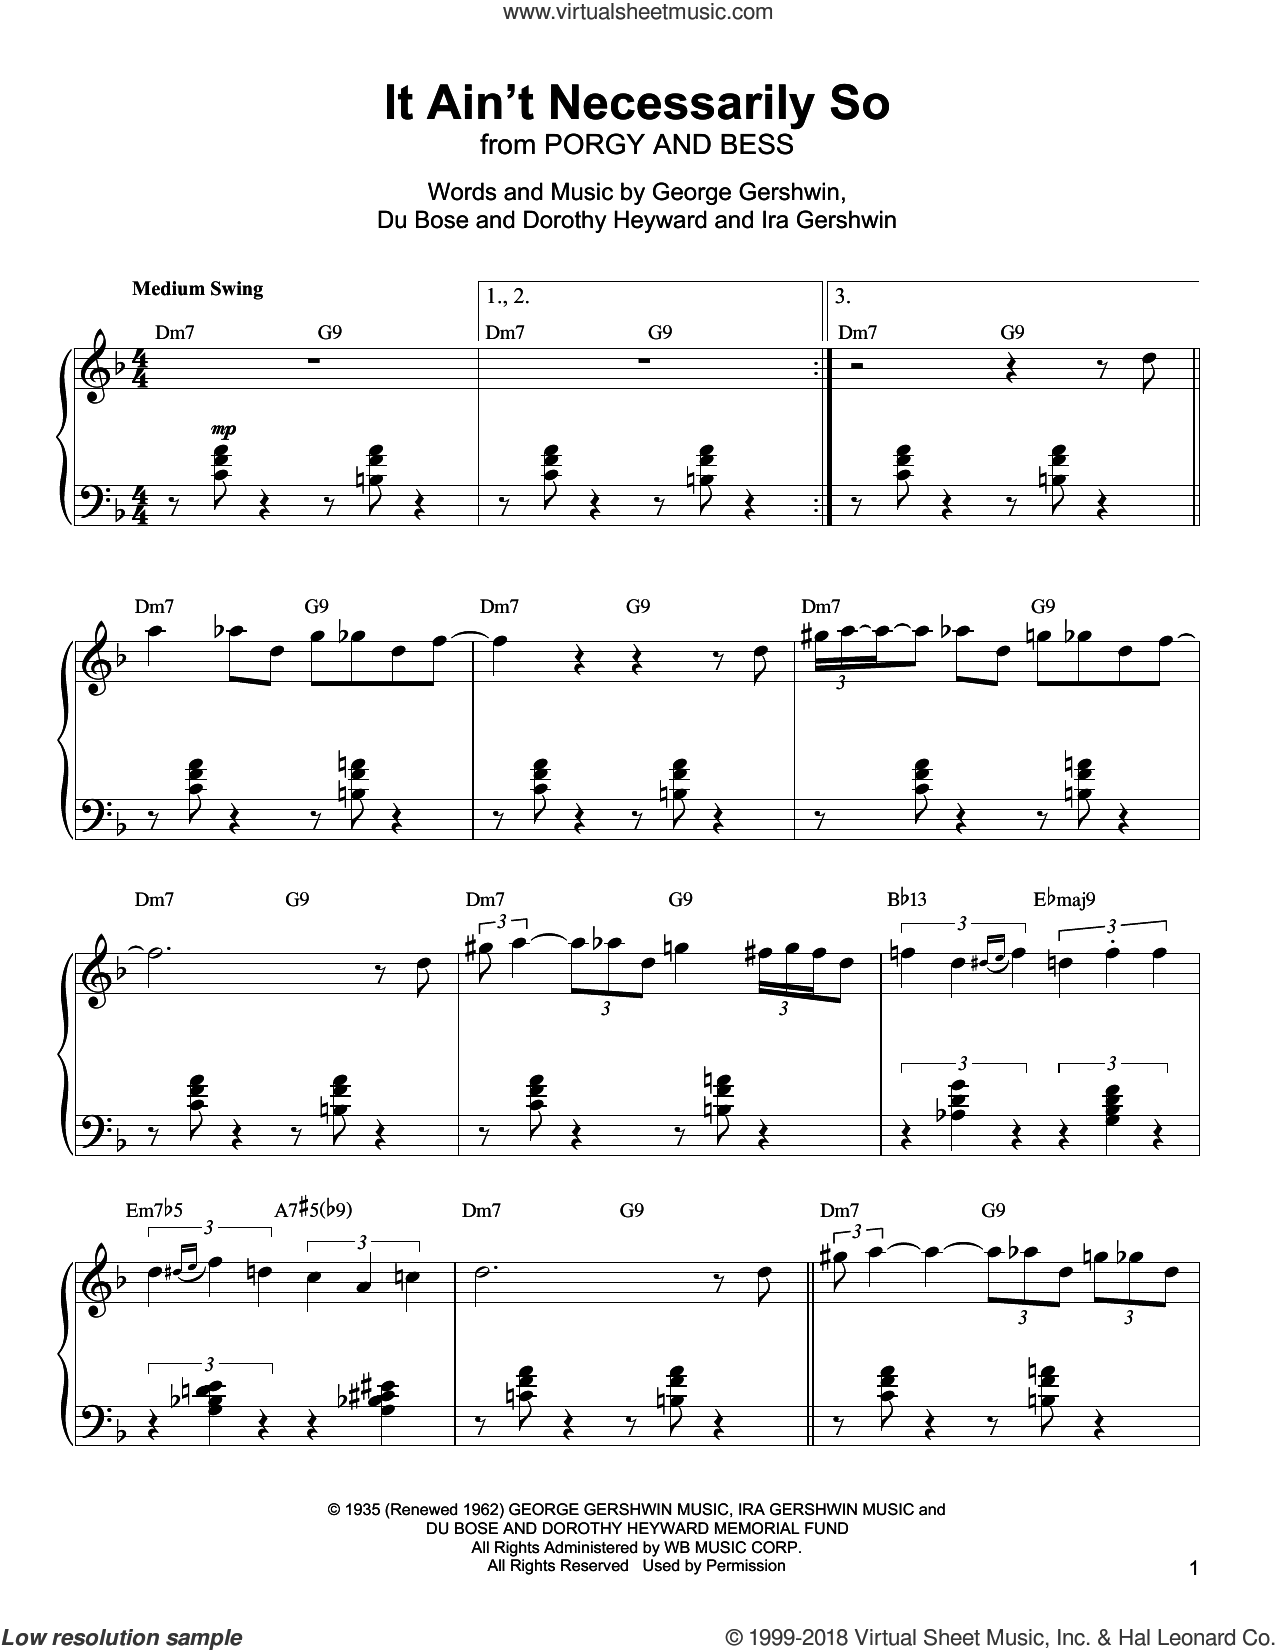 It Ain't Necessarily So sheet music for piano solo (transcription) by Oscar Peterson, Dorothy Heyward, DuBose Heyward and Ira Gershwin, intermediate piano (transcription)